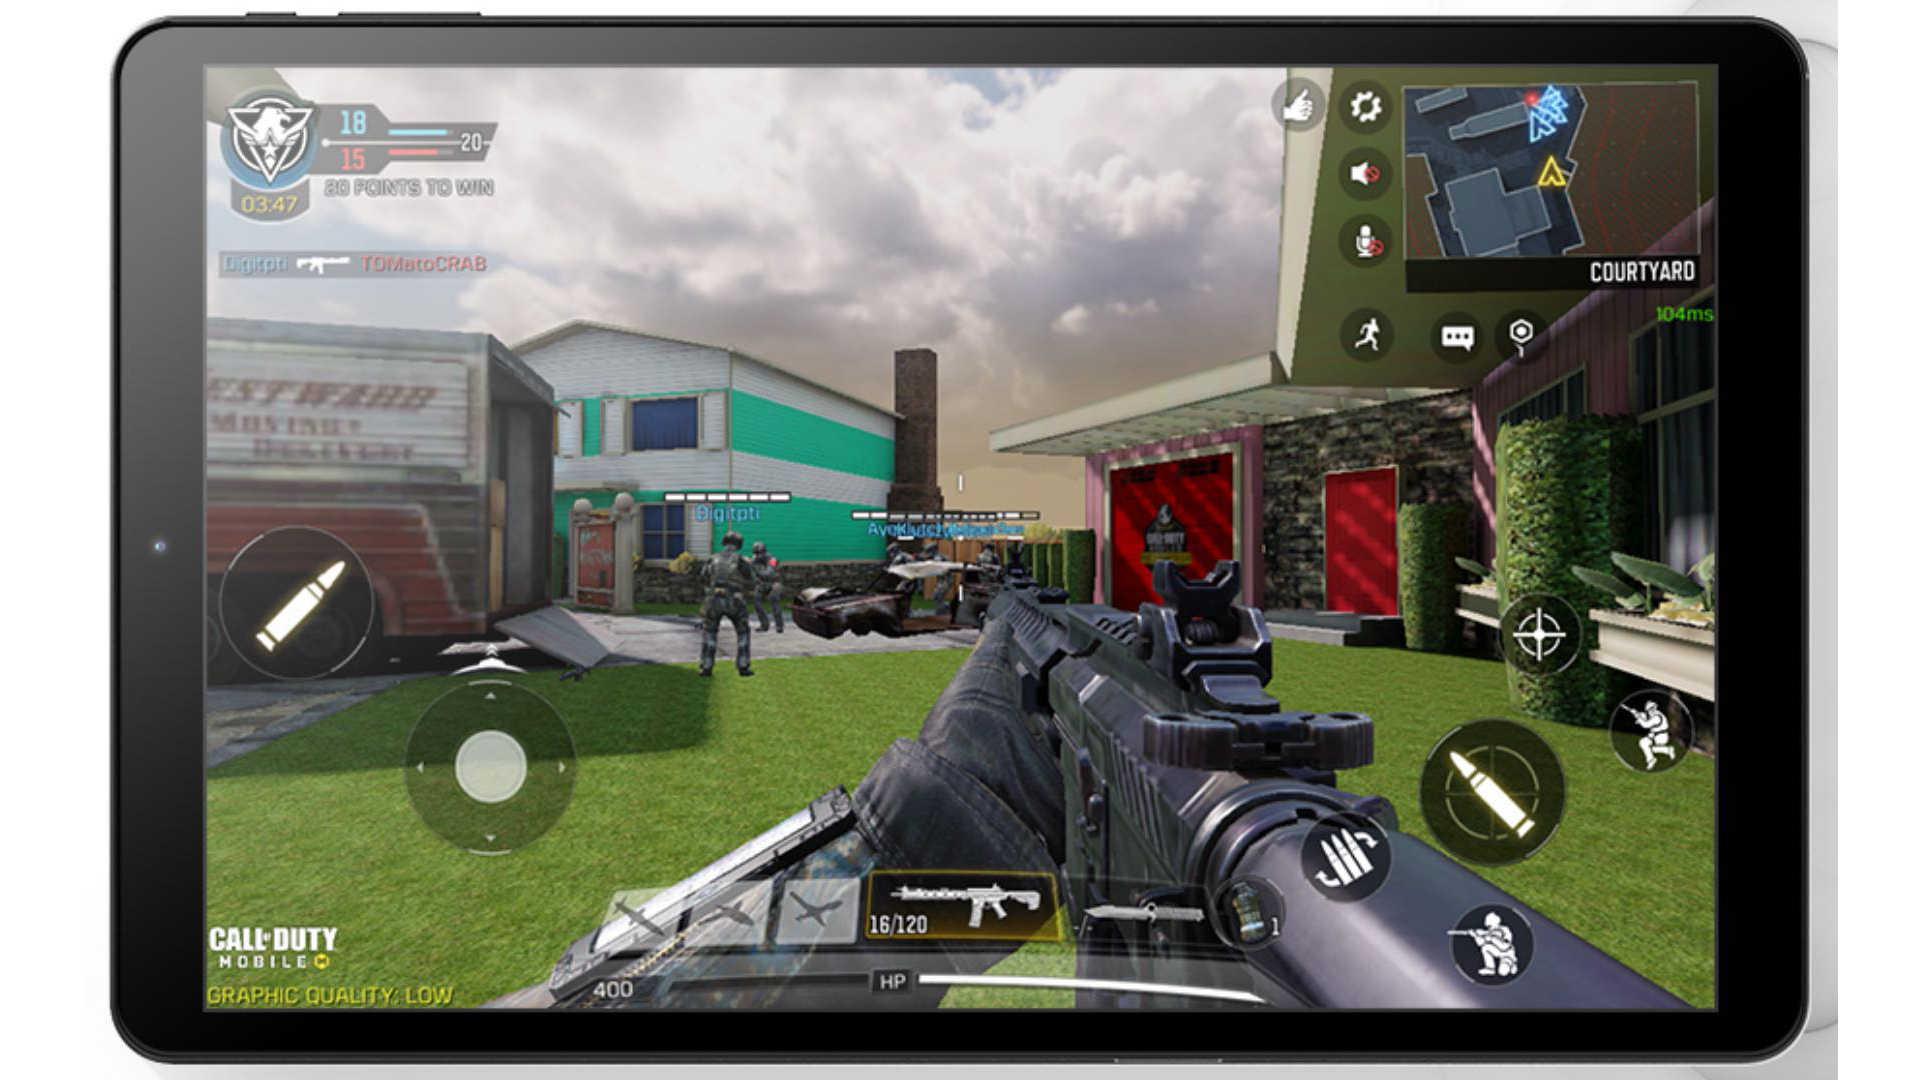 Alldocube iPlay 30 Pro – Banggood